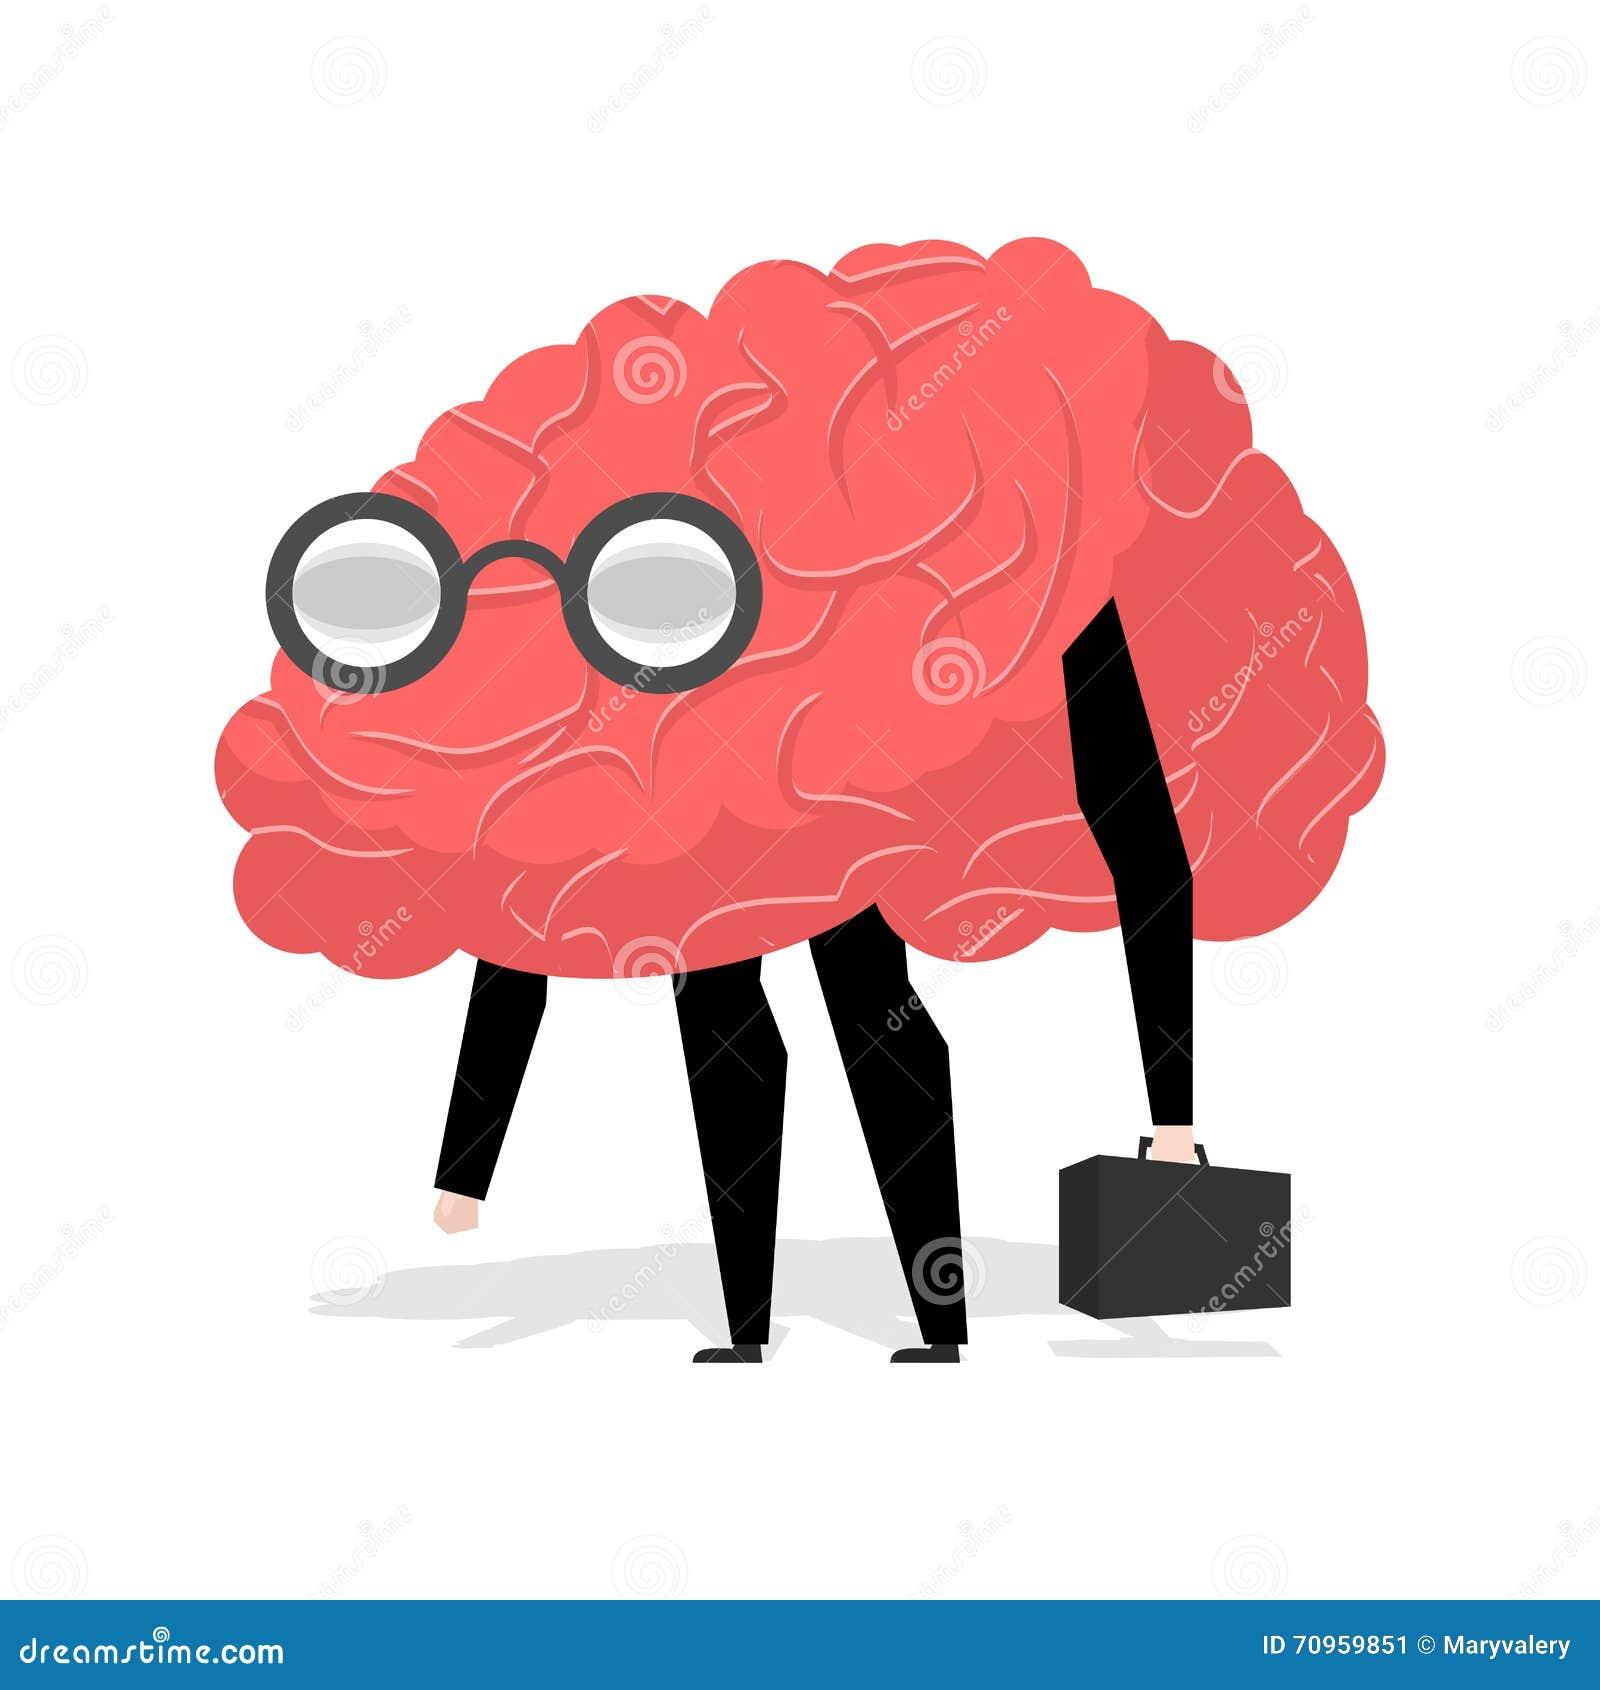 Cute Cartoon Smart Brain Cartoondealer Com 86062941